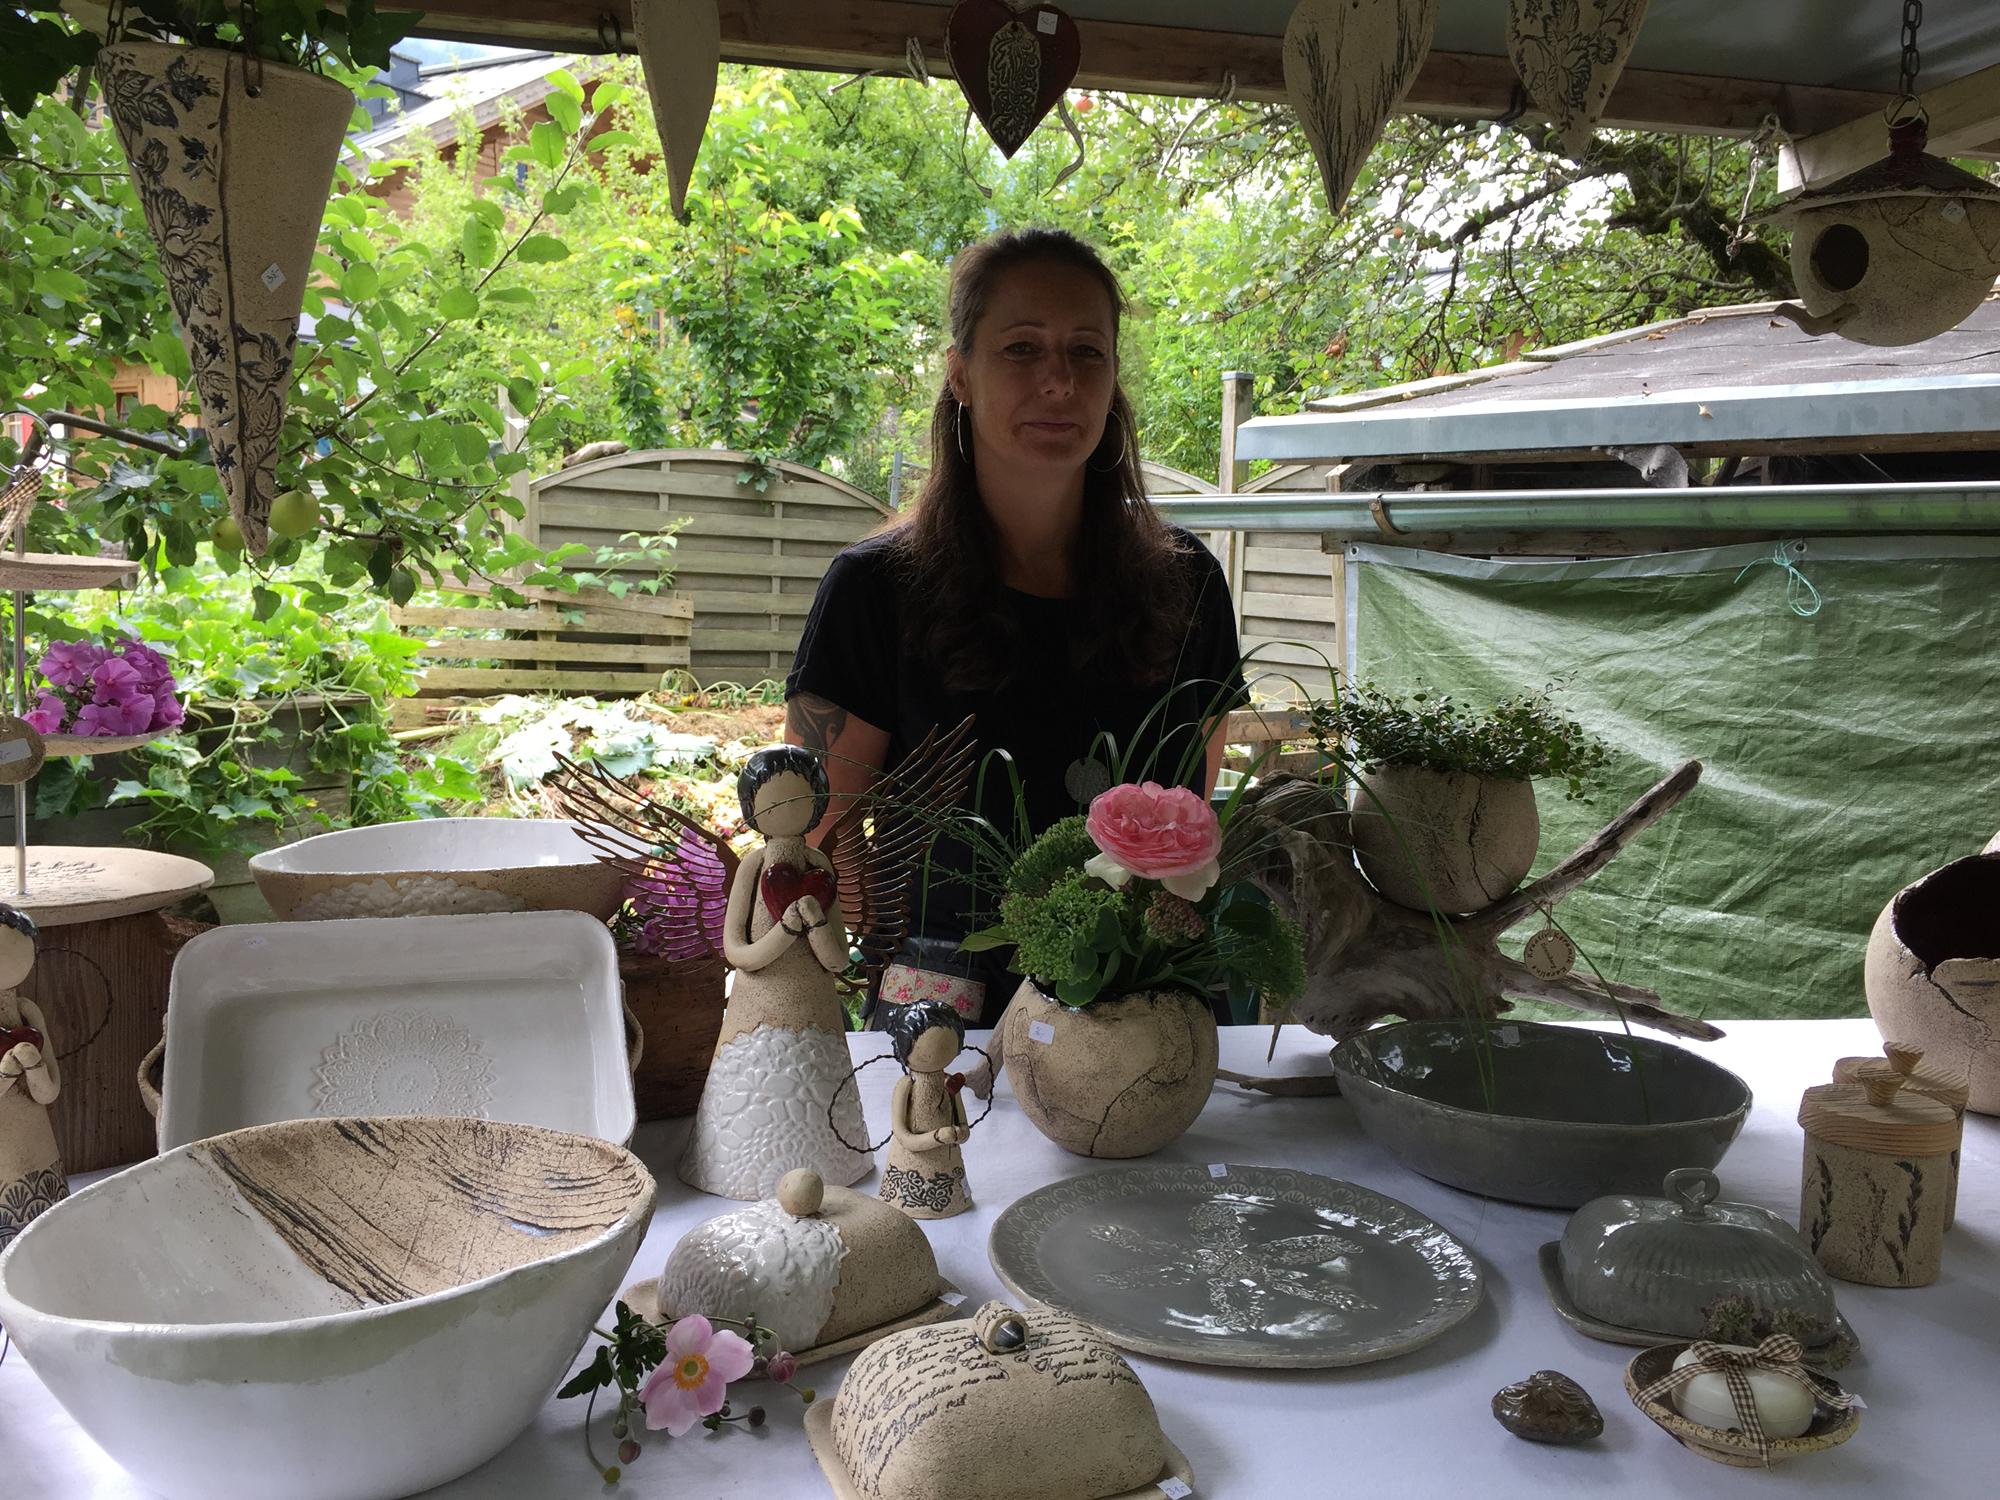 Keramikwaren auf dem Bauernmarkt